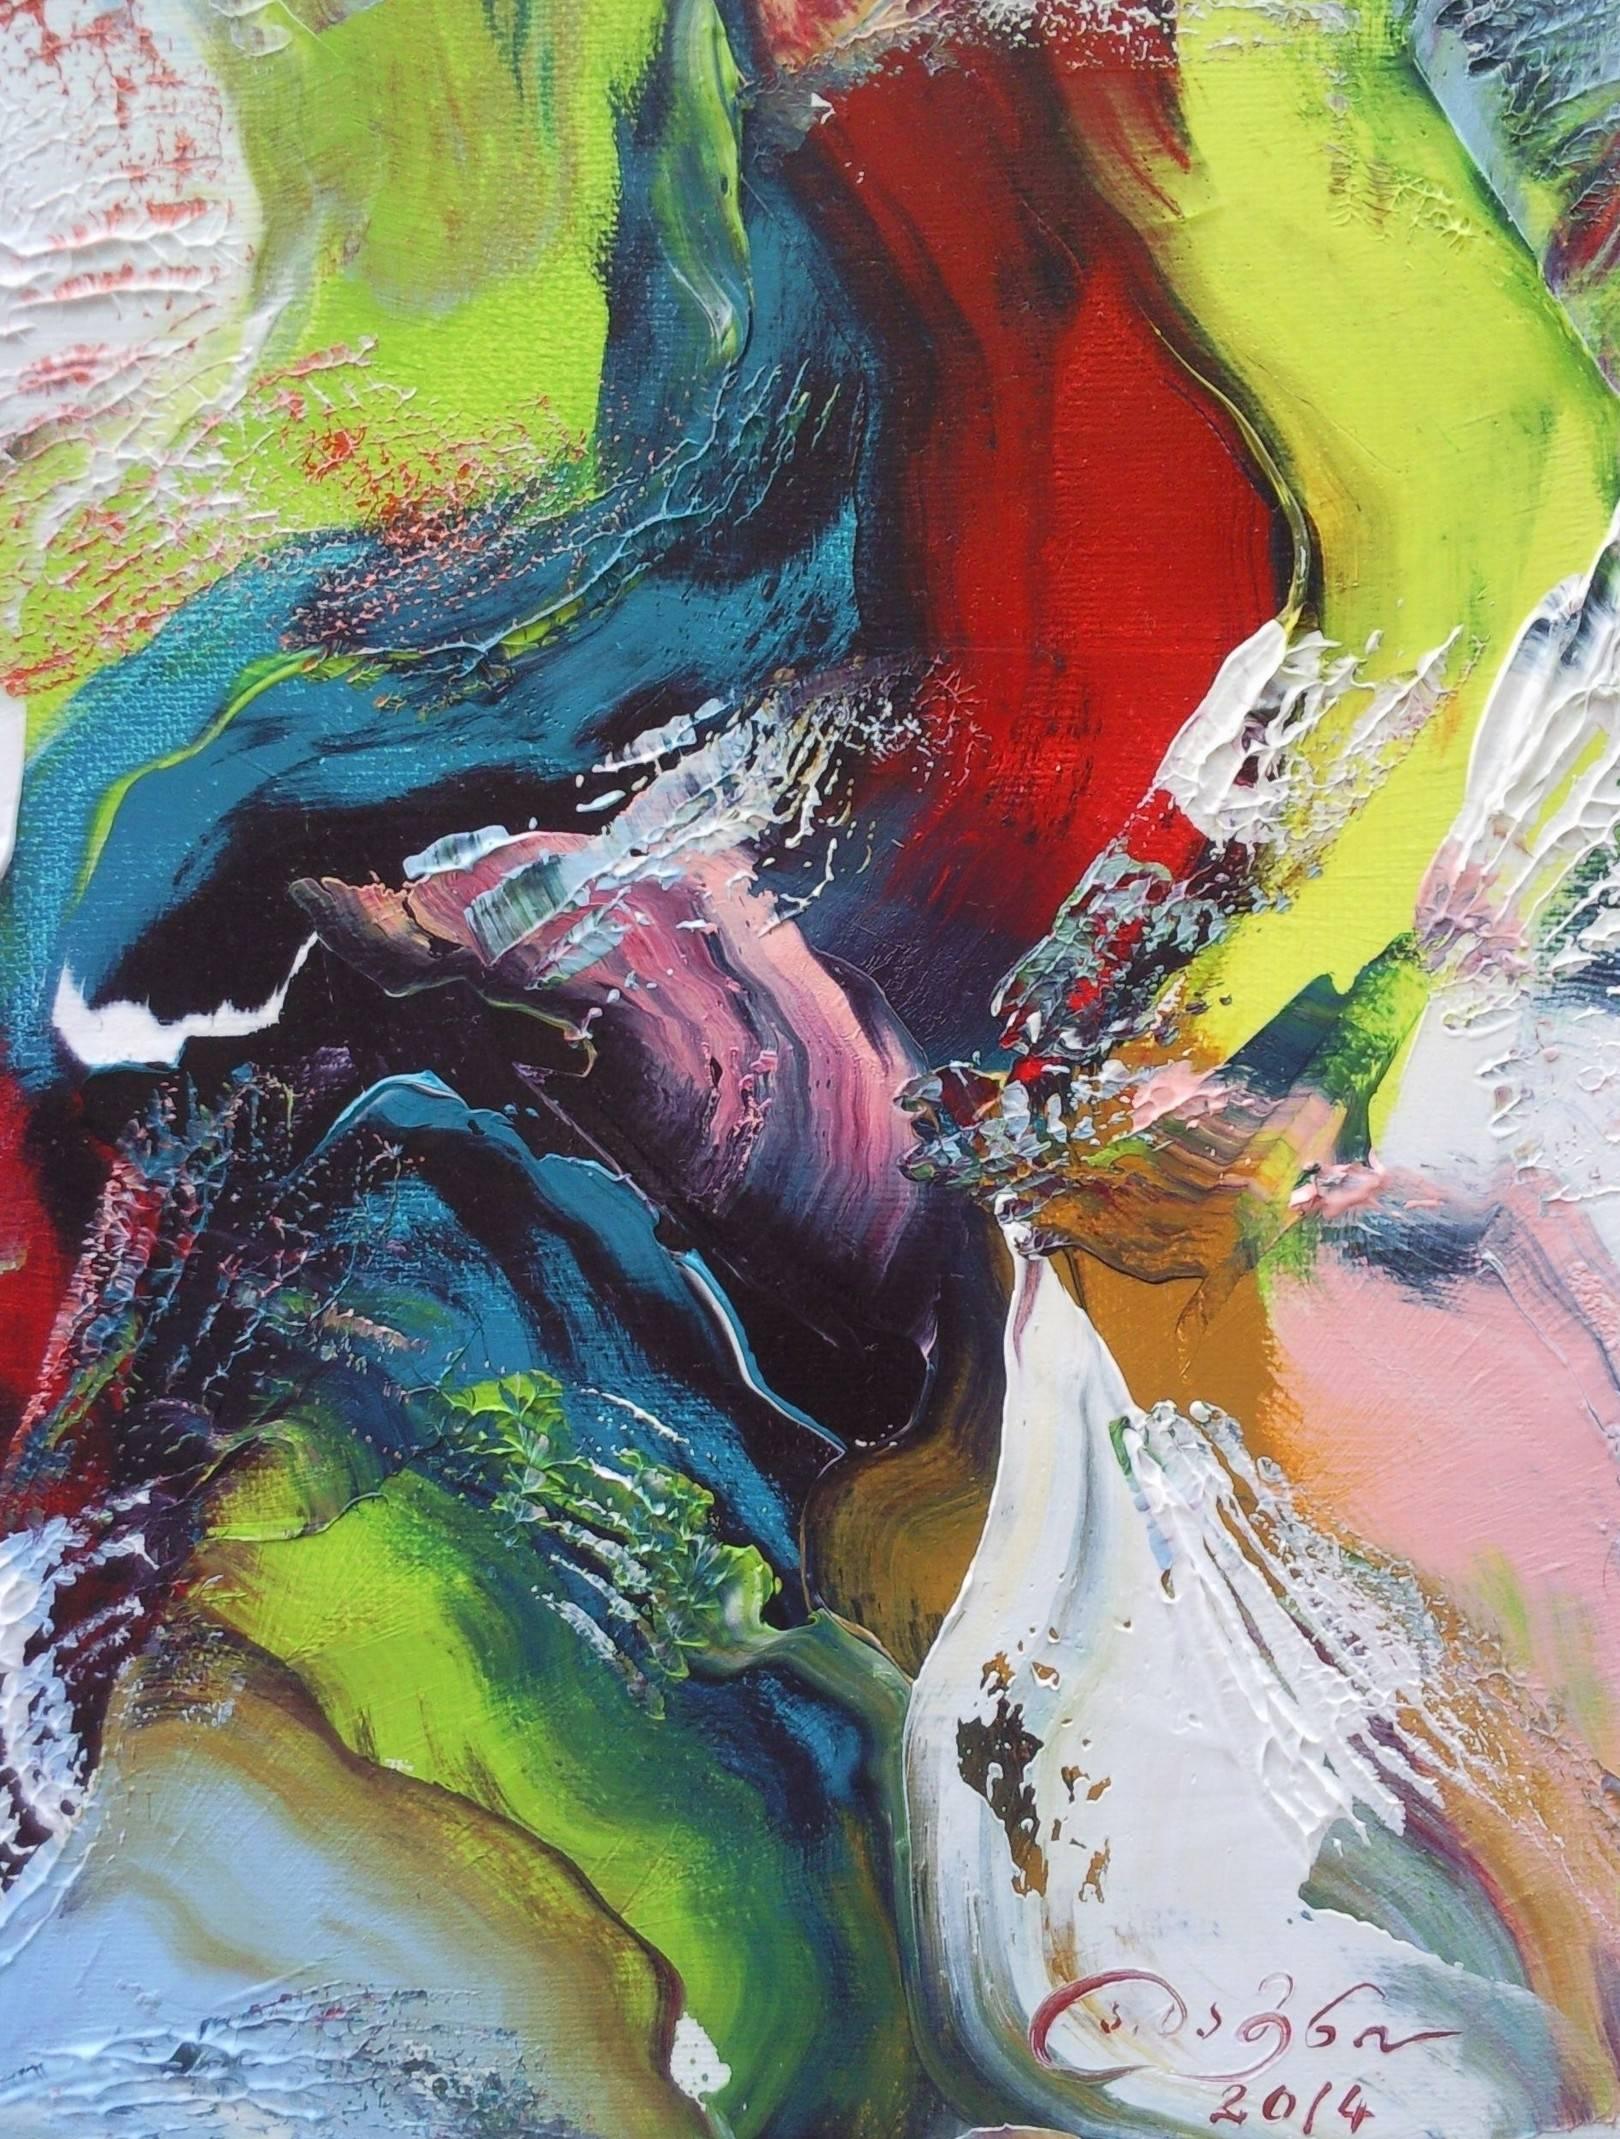 «Восточный танец»              холст, масло «Oriental dance»                    oil on canvas                                                  30x24, 2014